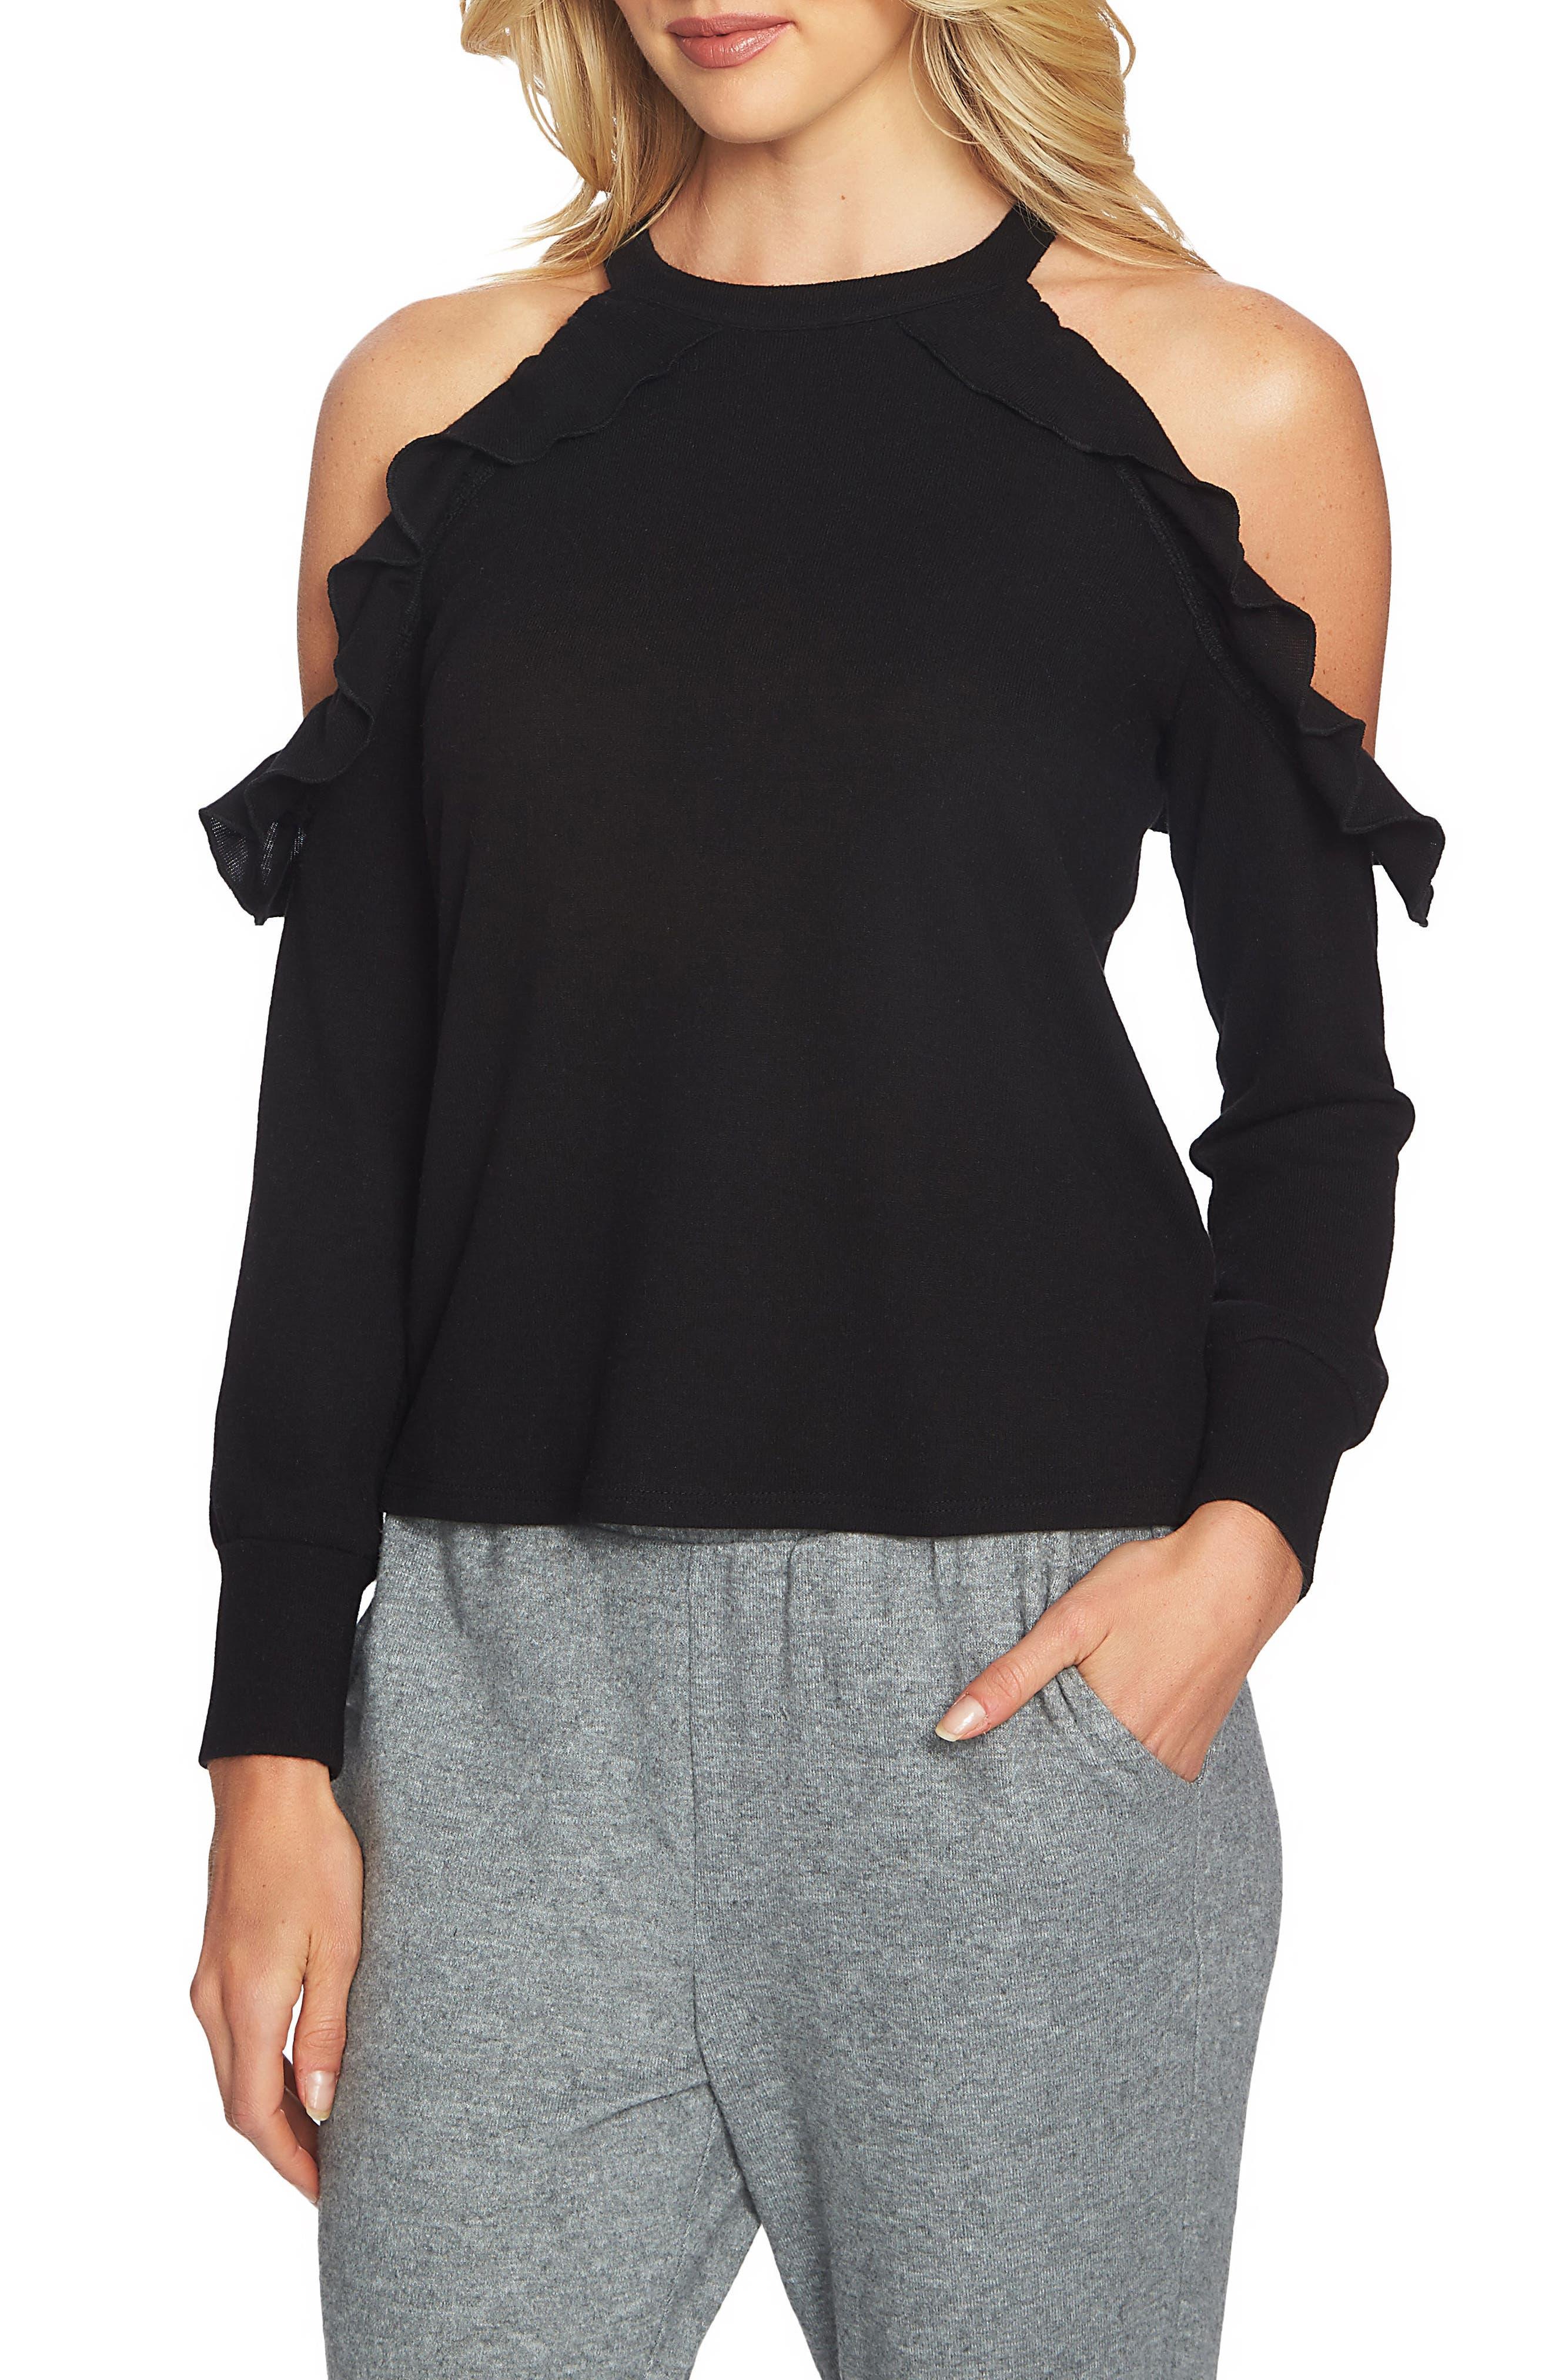 The Cozy Cold Shoulder Knit Top,                         Main,                         color, 010